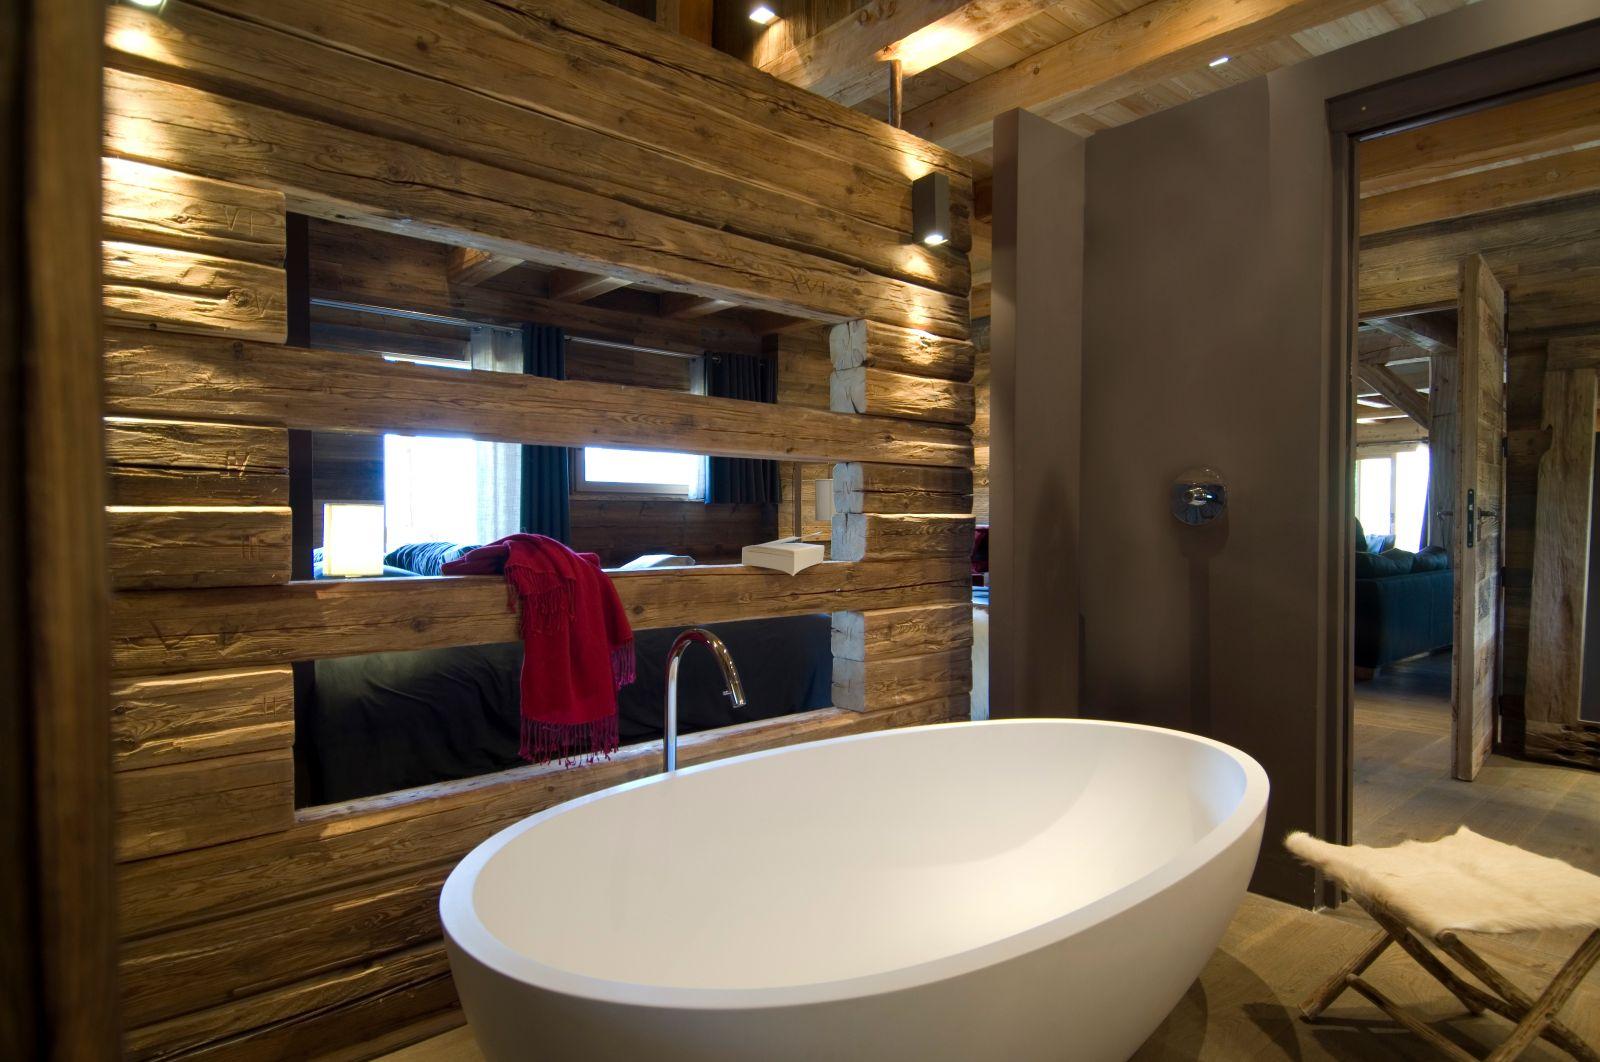 Salle De Bain Chalet serre chevalier luxury chalet rentals ski slopes indoor pool spa concierge  services (1)